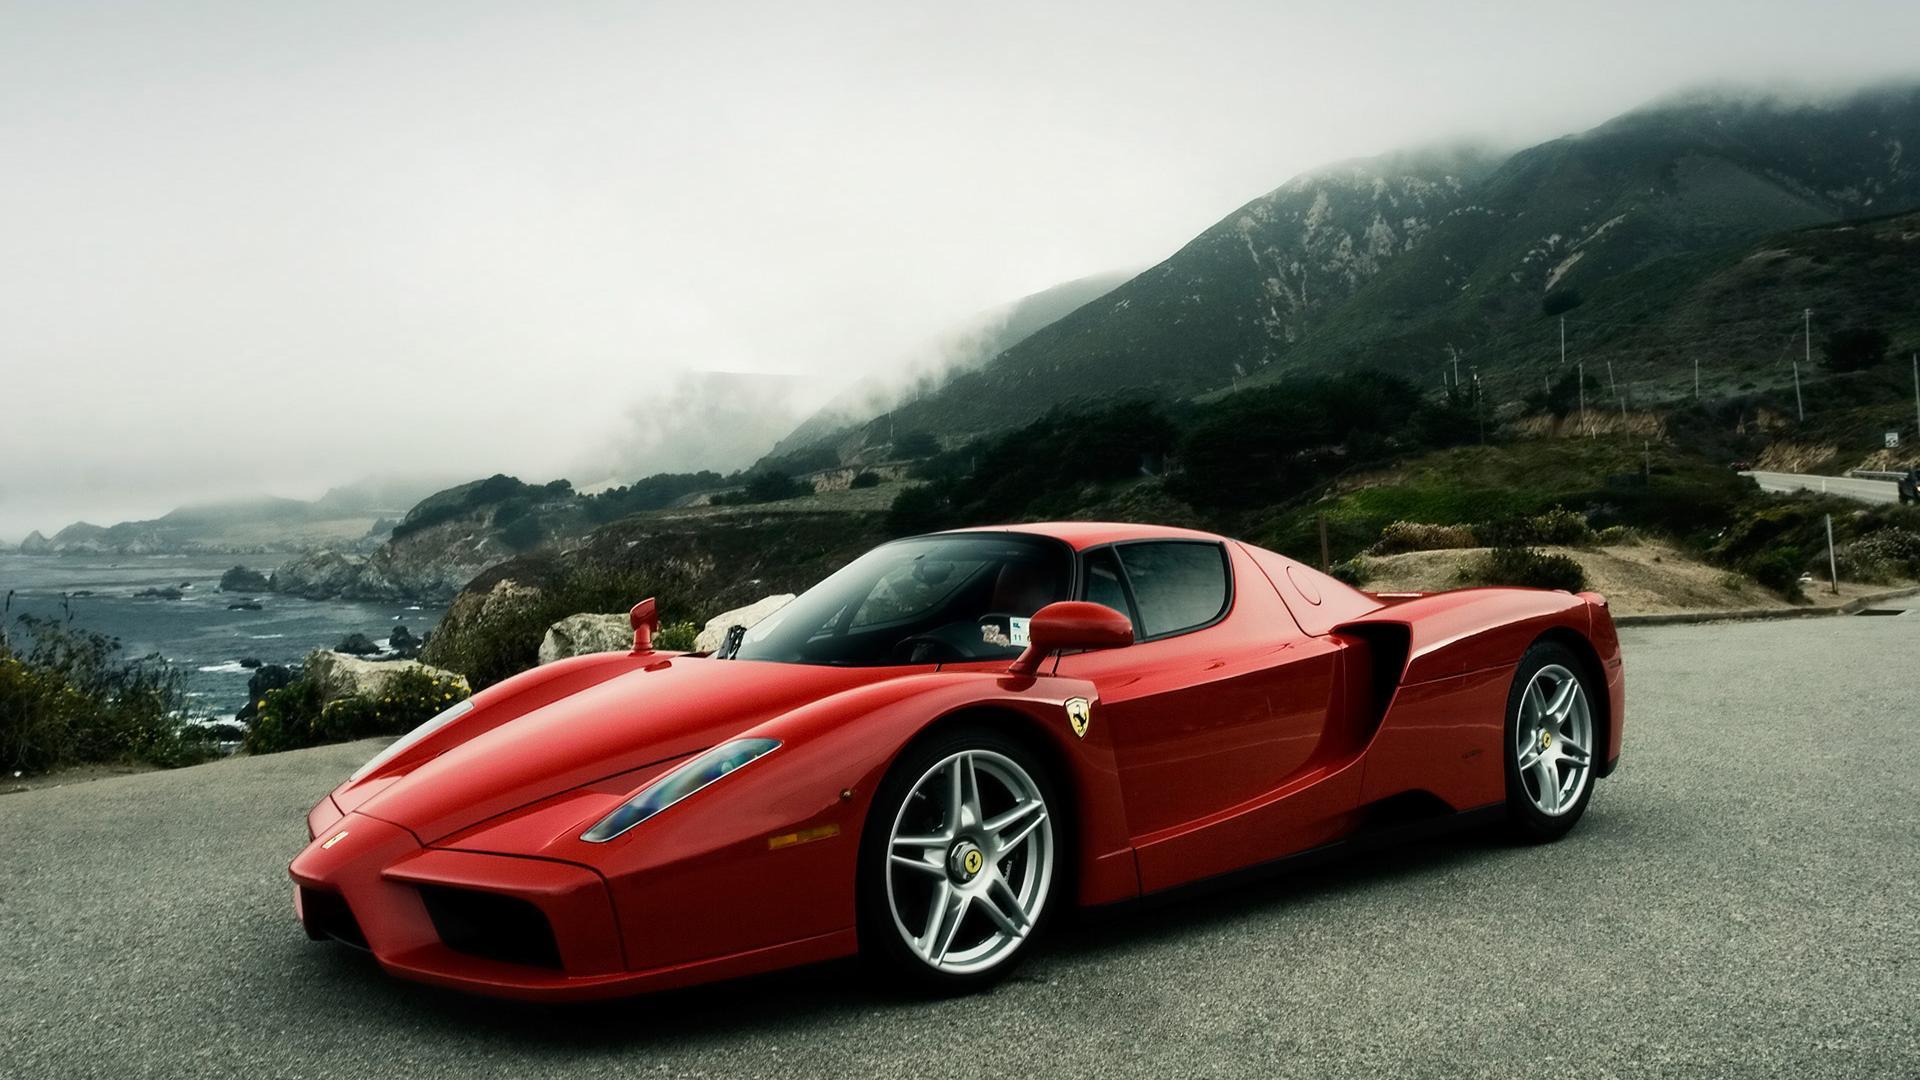 Ferrari Enzo Supercar HD Wallpaper - HD